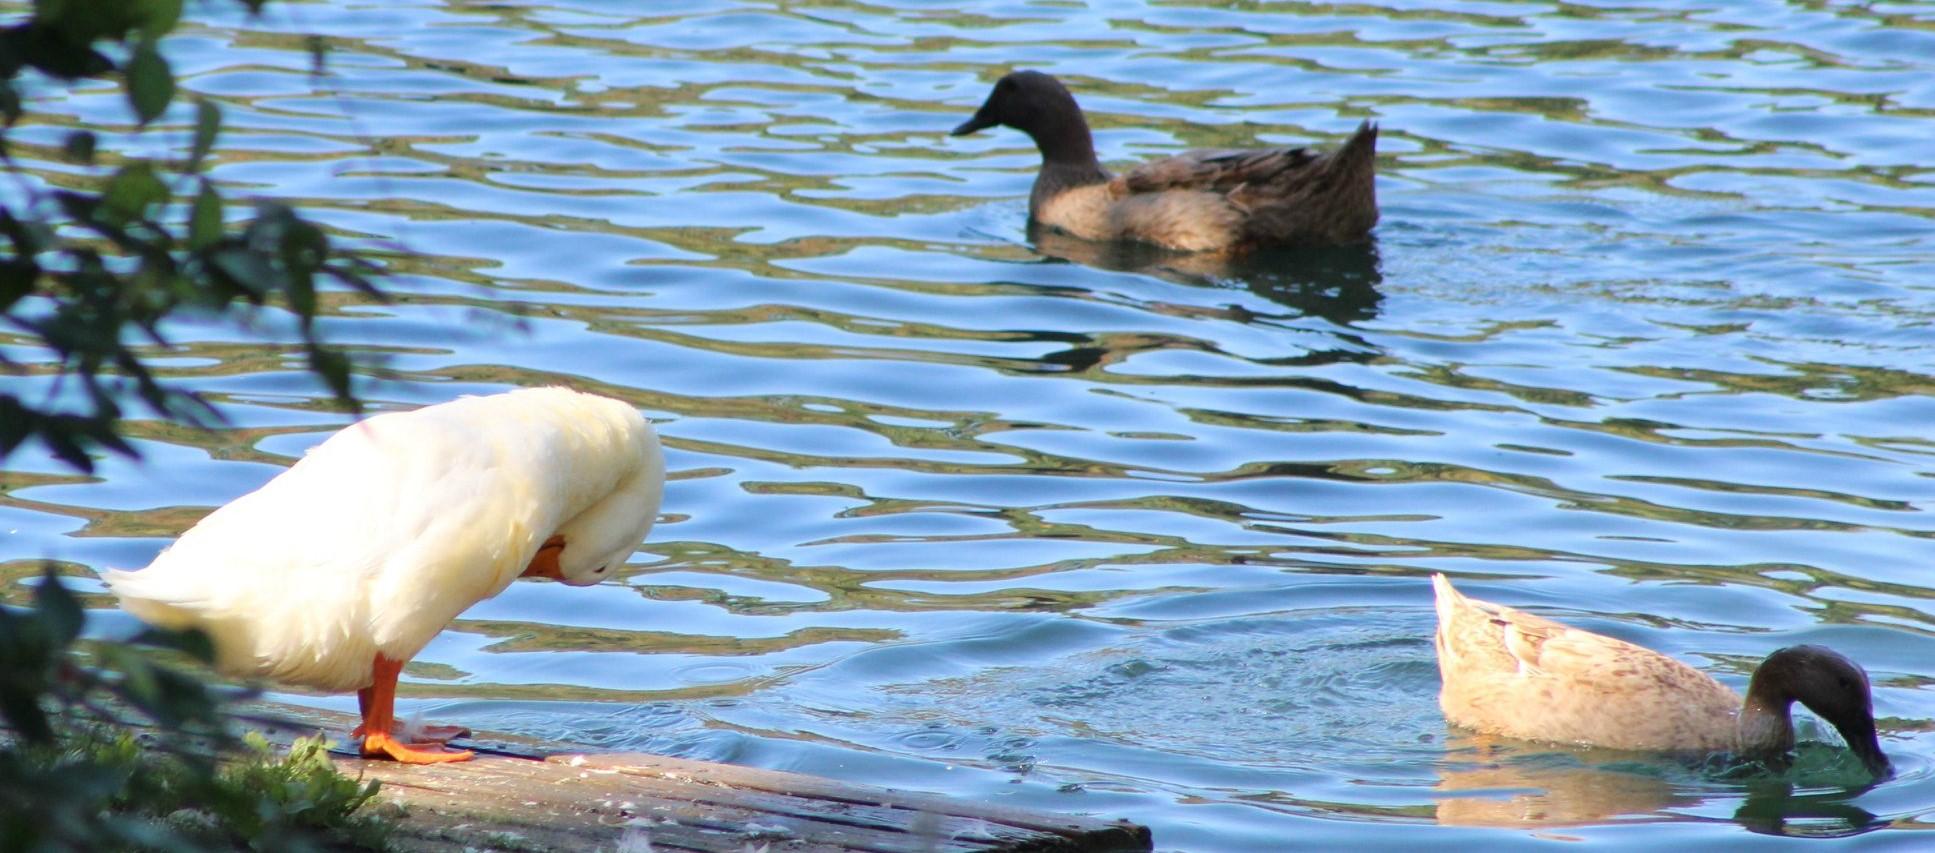 Ducks image 1.jpg